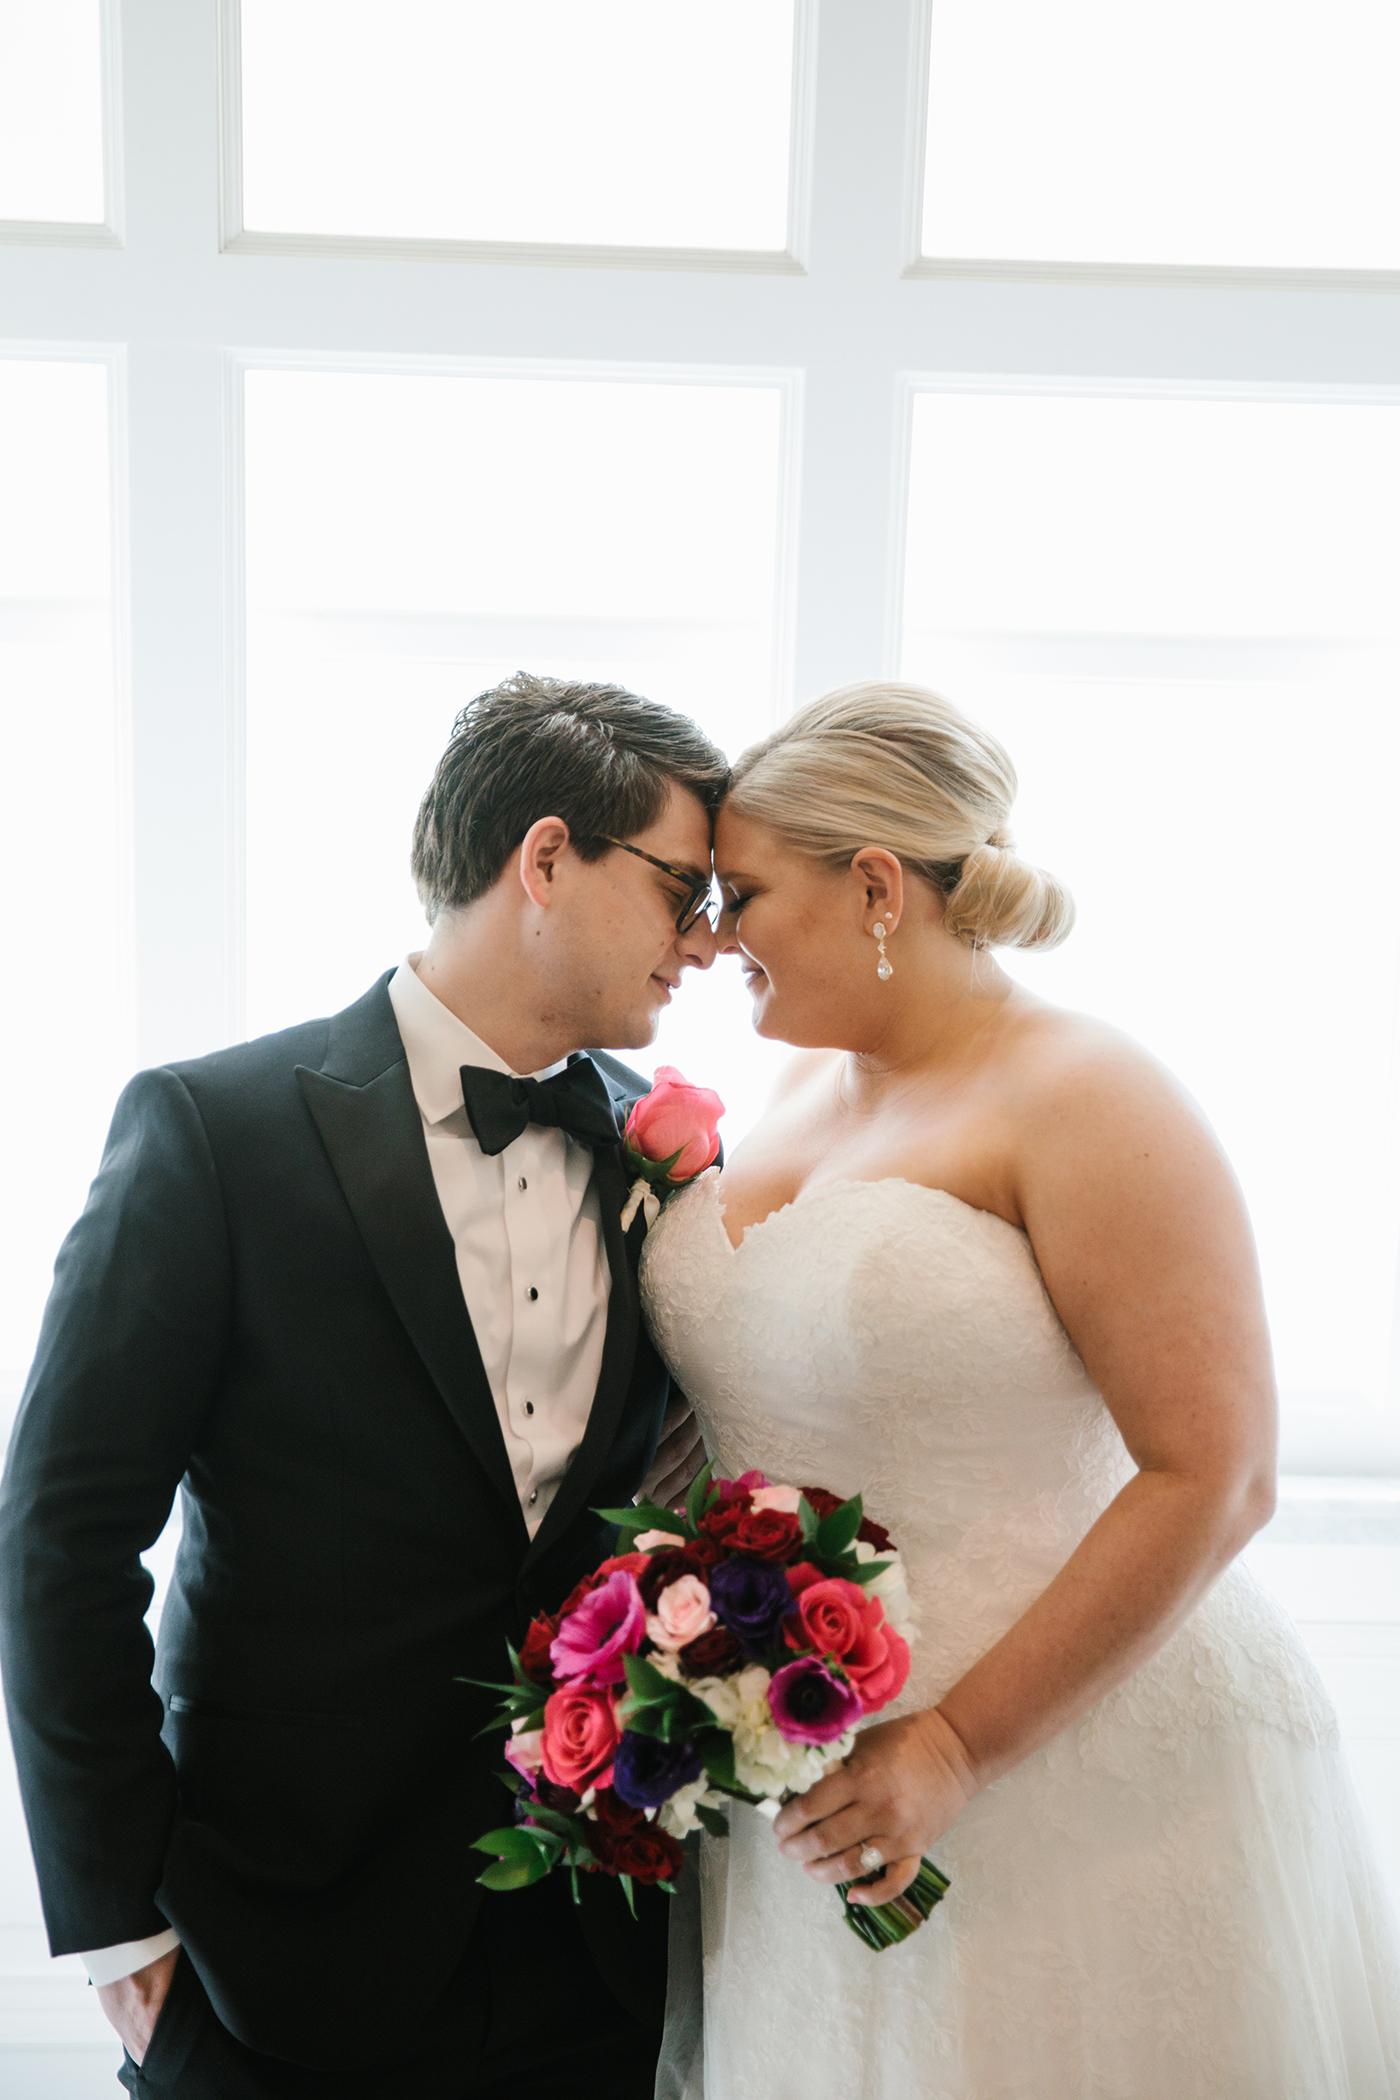 Dallas Weddings Planner - Allday Events - Katie + Matthew at The Adolphus Hotel - 190.jpg